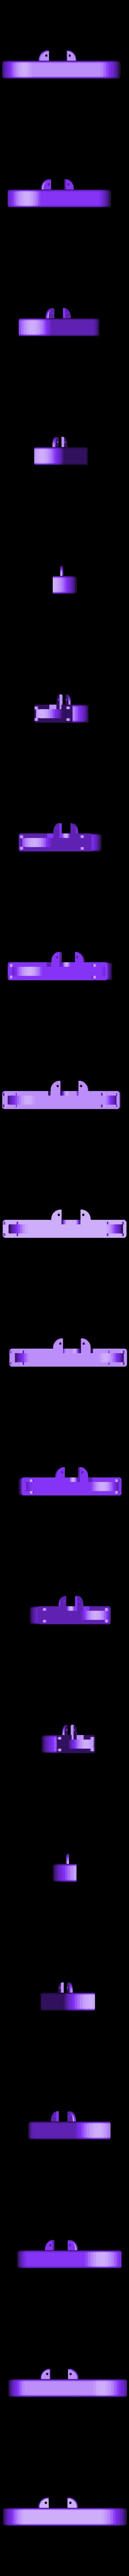 FGC9_ejector_cover_V2.stl Download free STL file FGC9 ejector cover • 3D print model, UntangleART